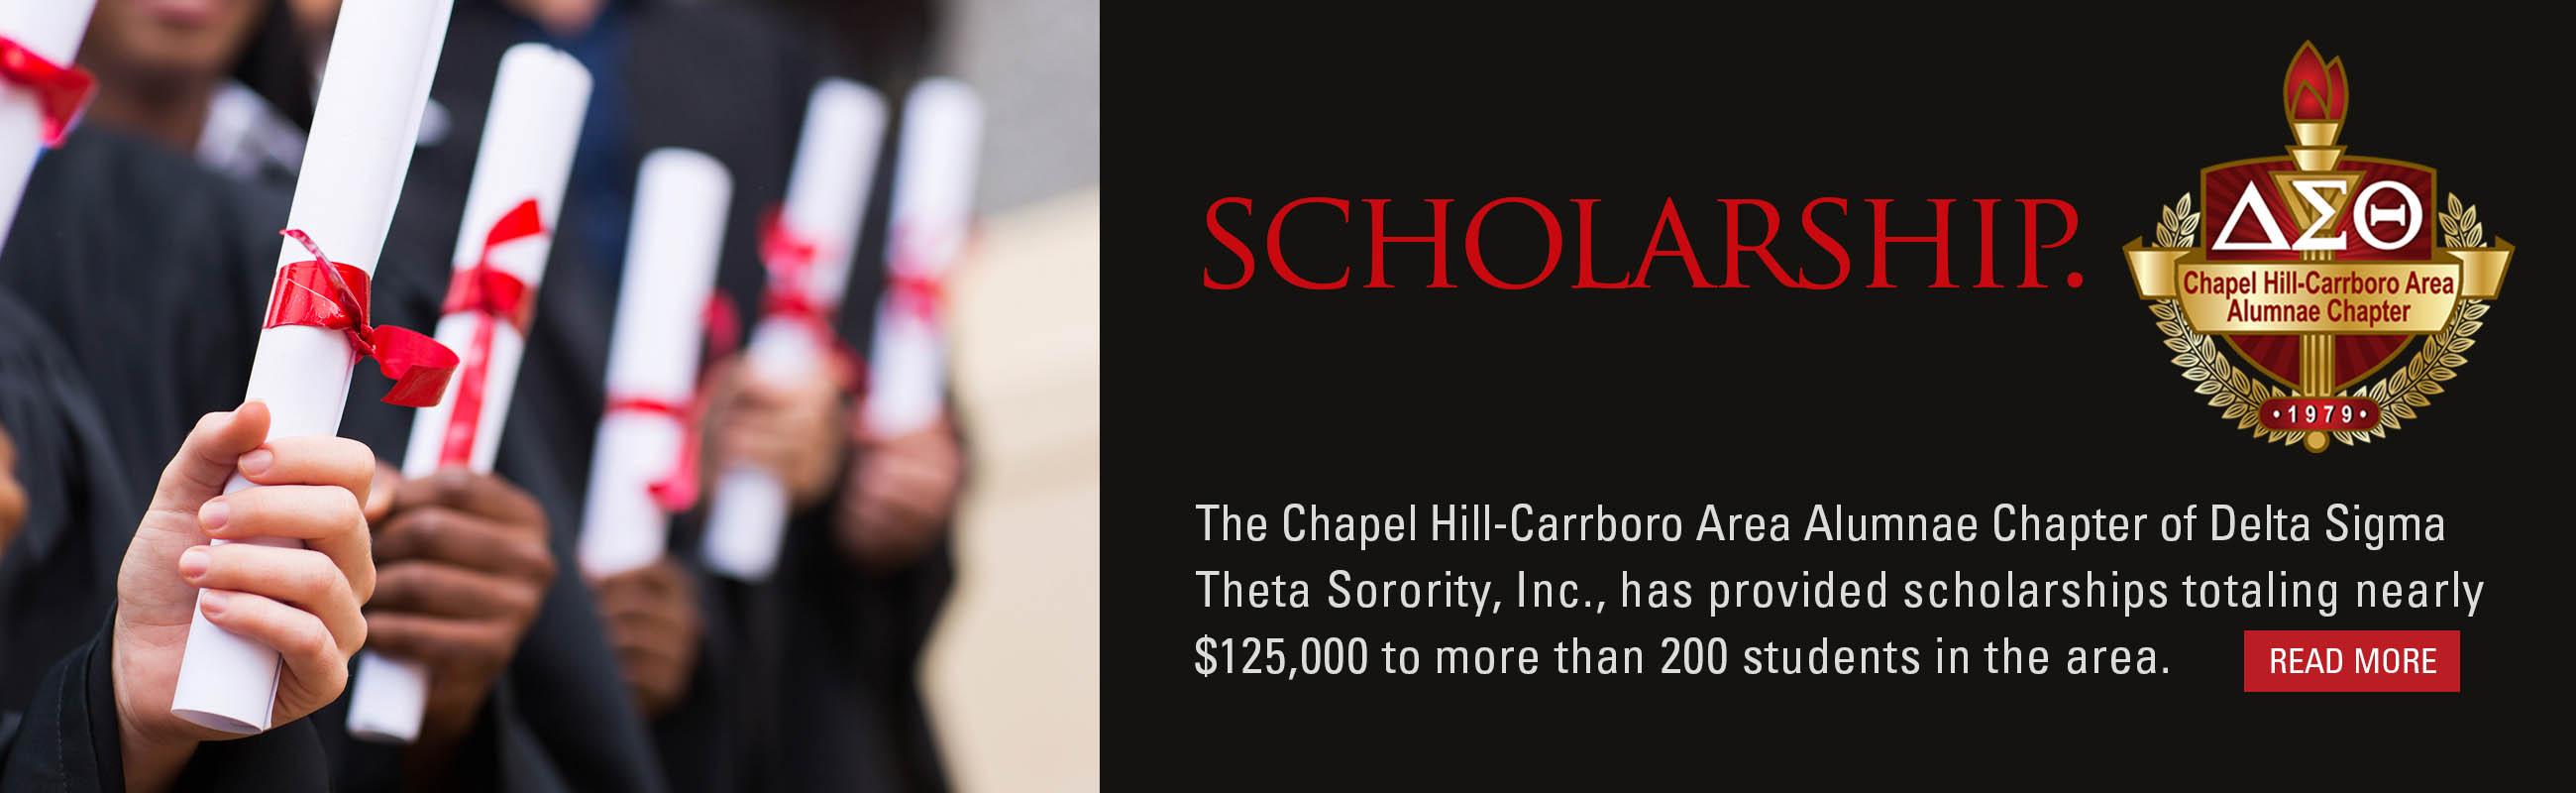 CHCAA_scholarship